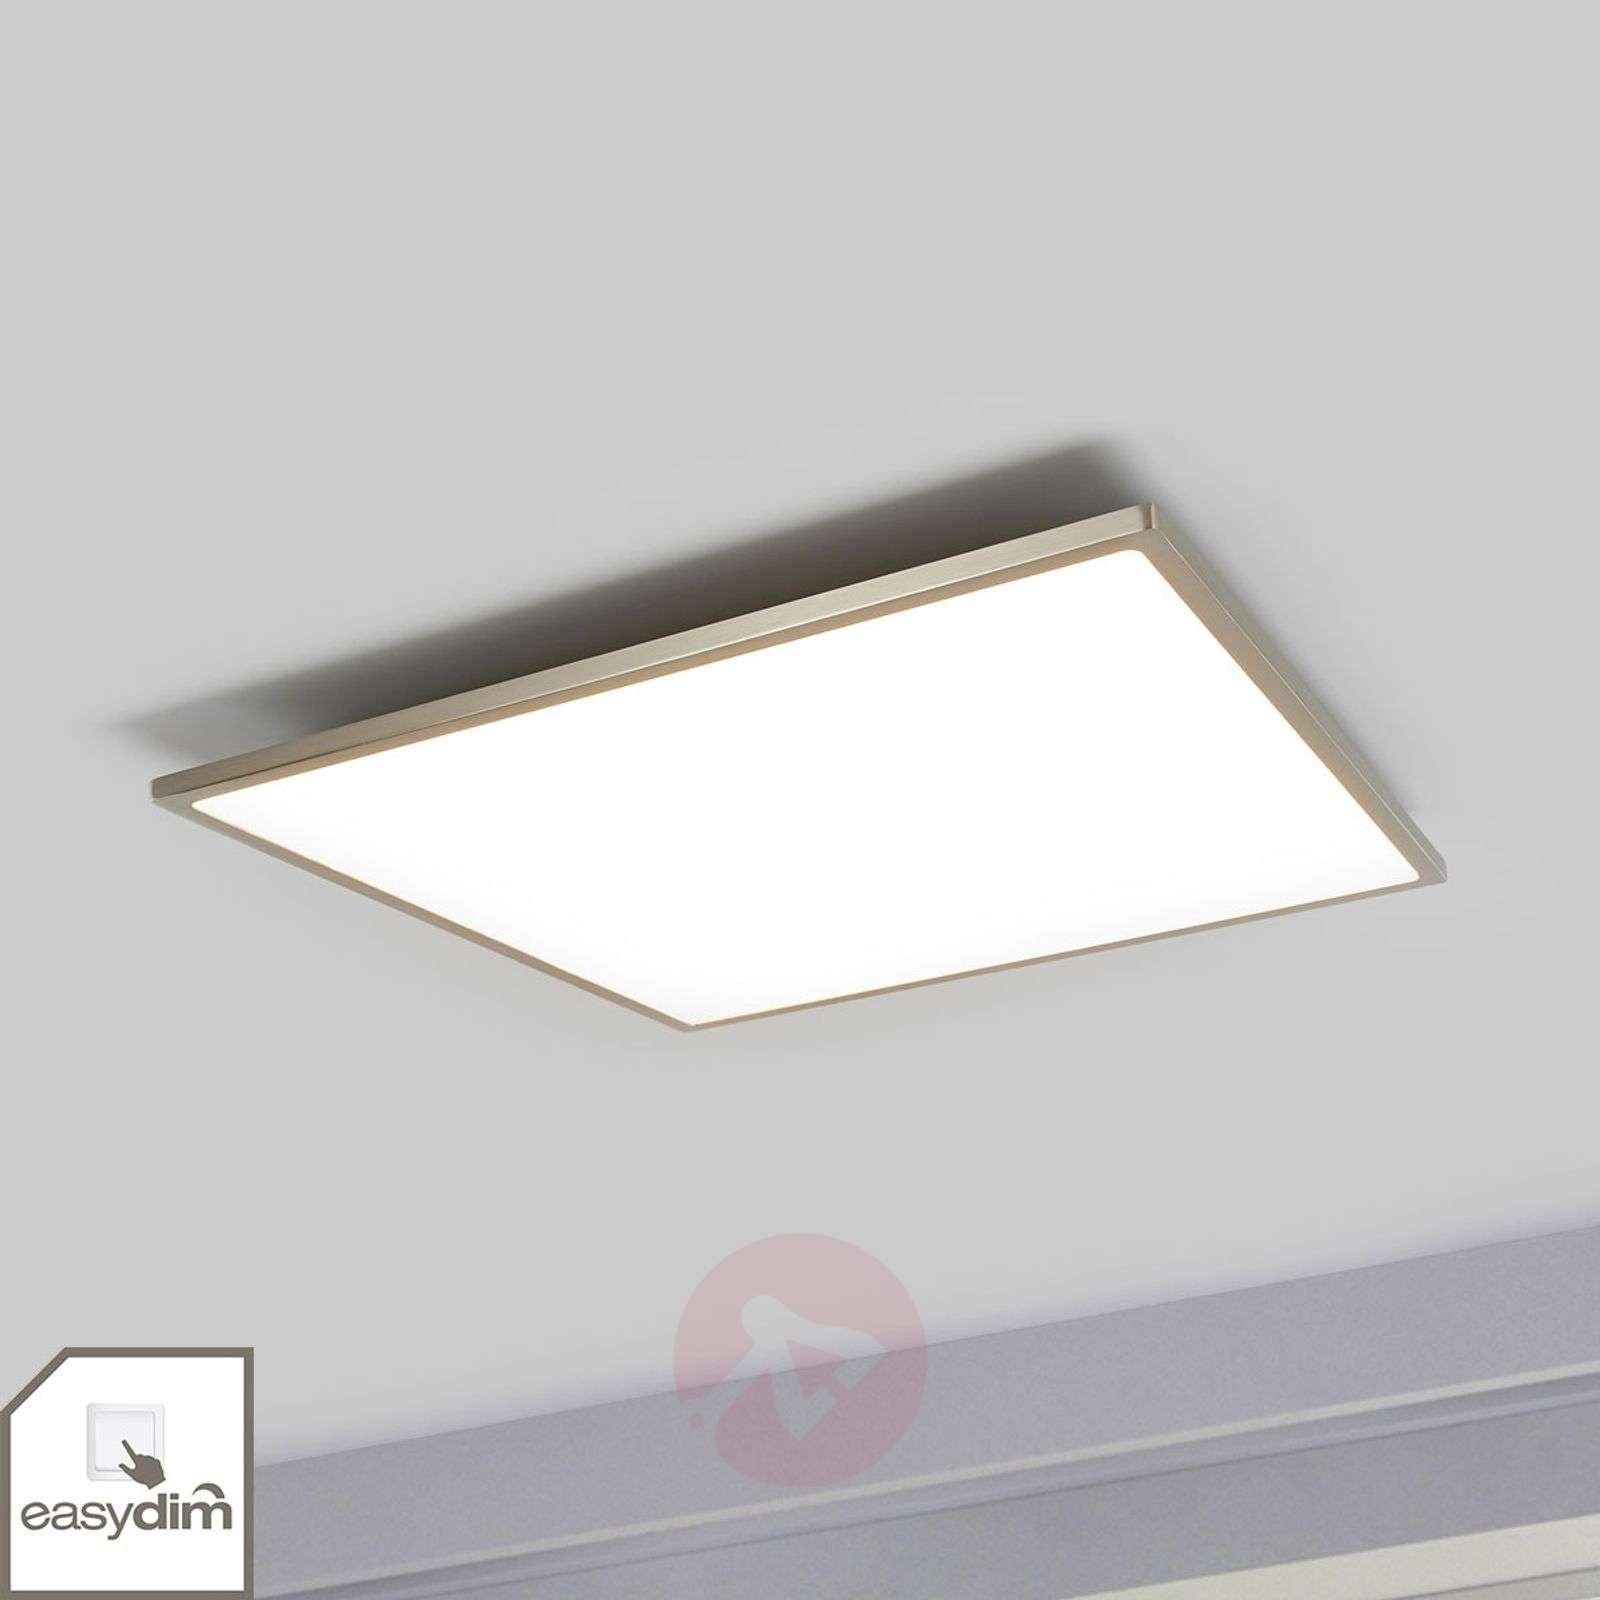 Nelikulmainen Ceres-Easydim-LED-kattovalaisin-1509255-01